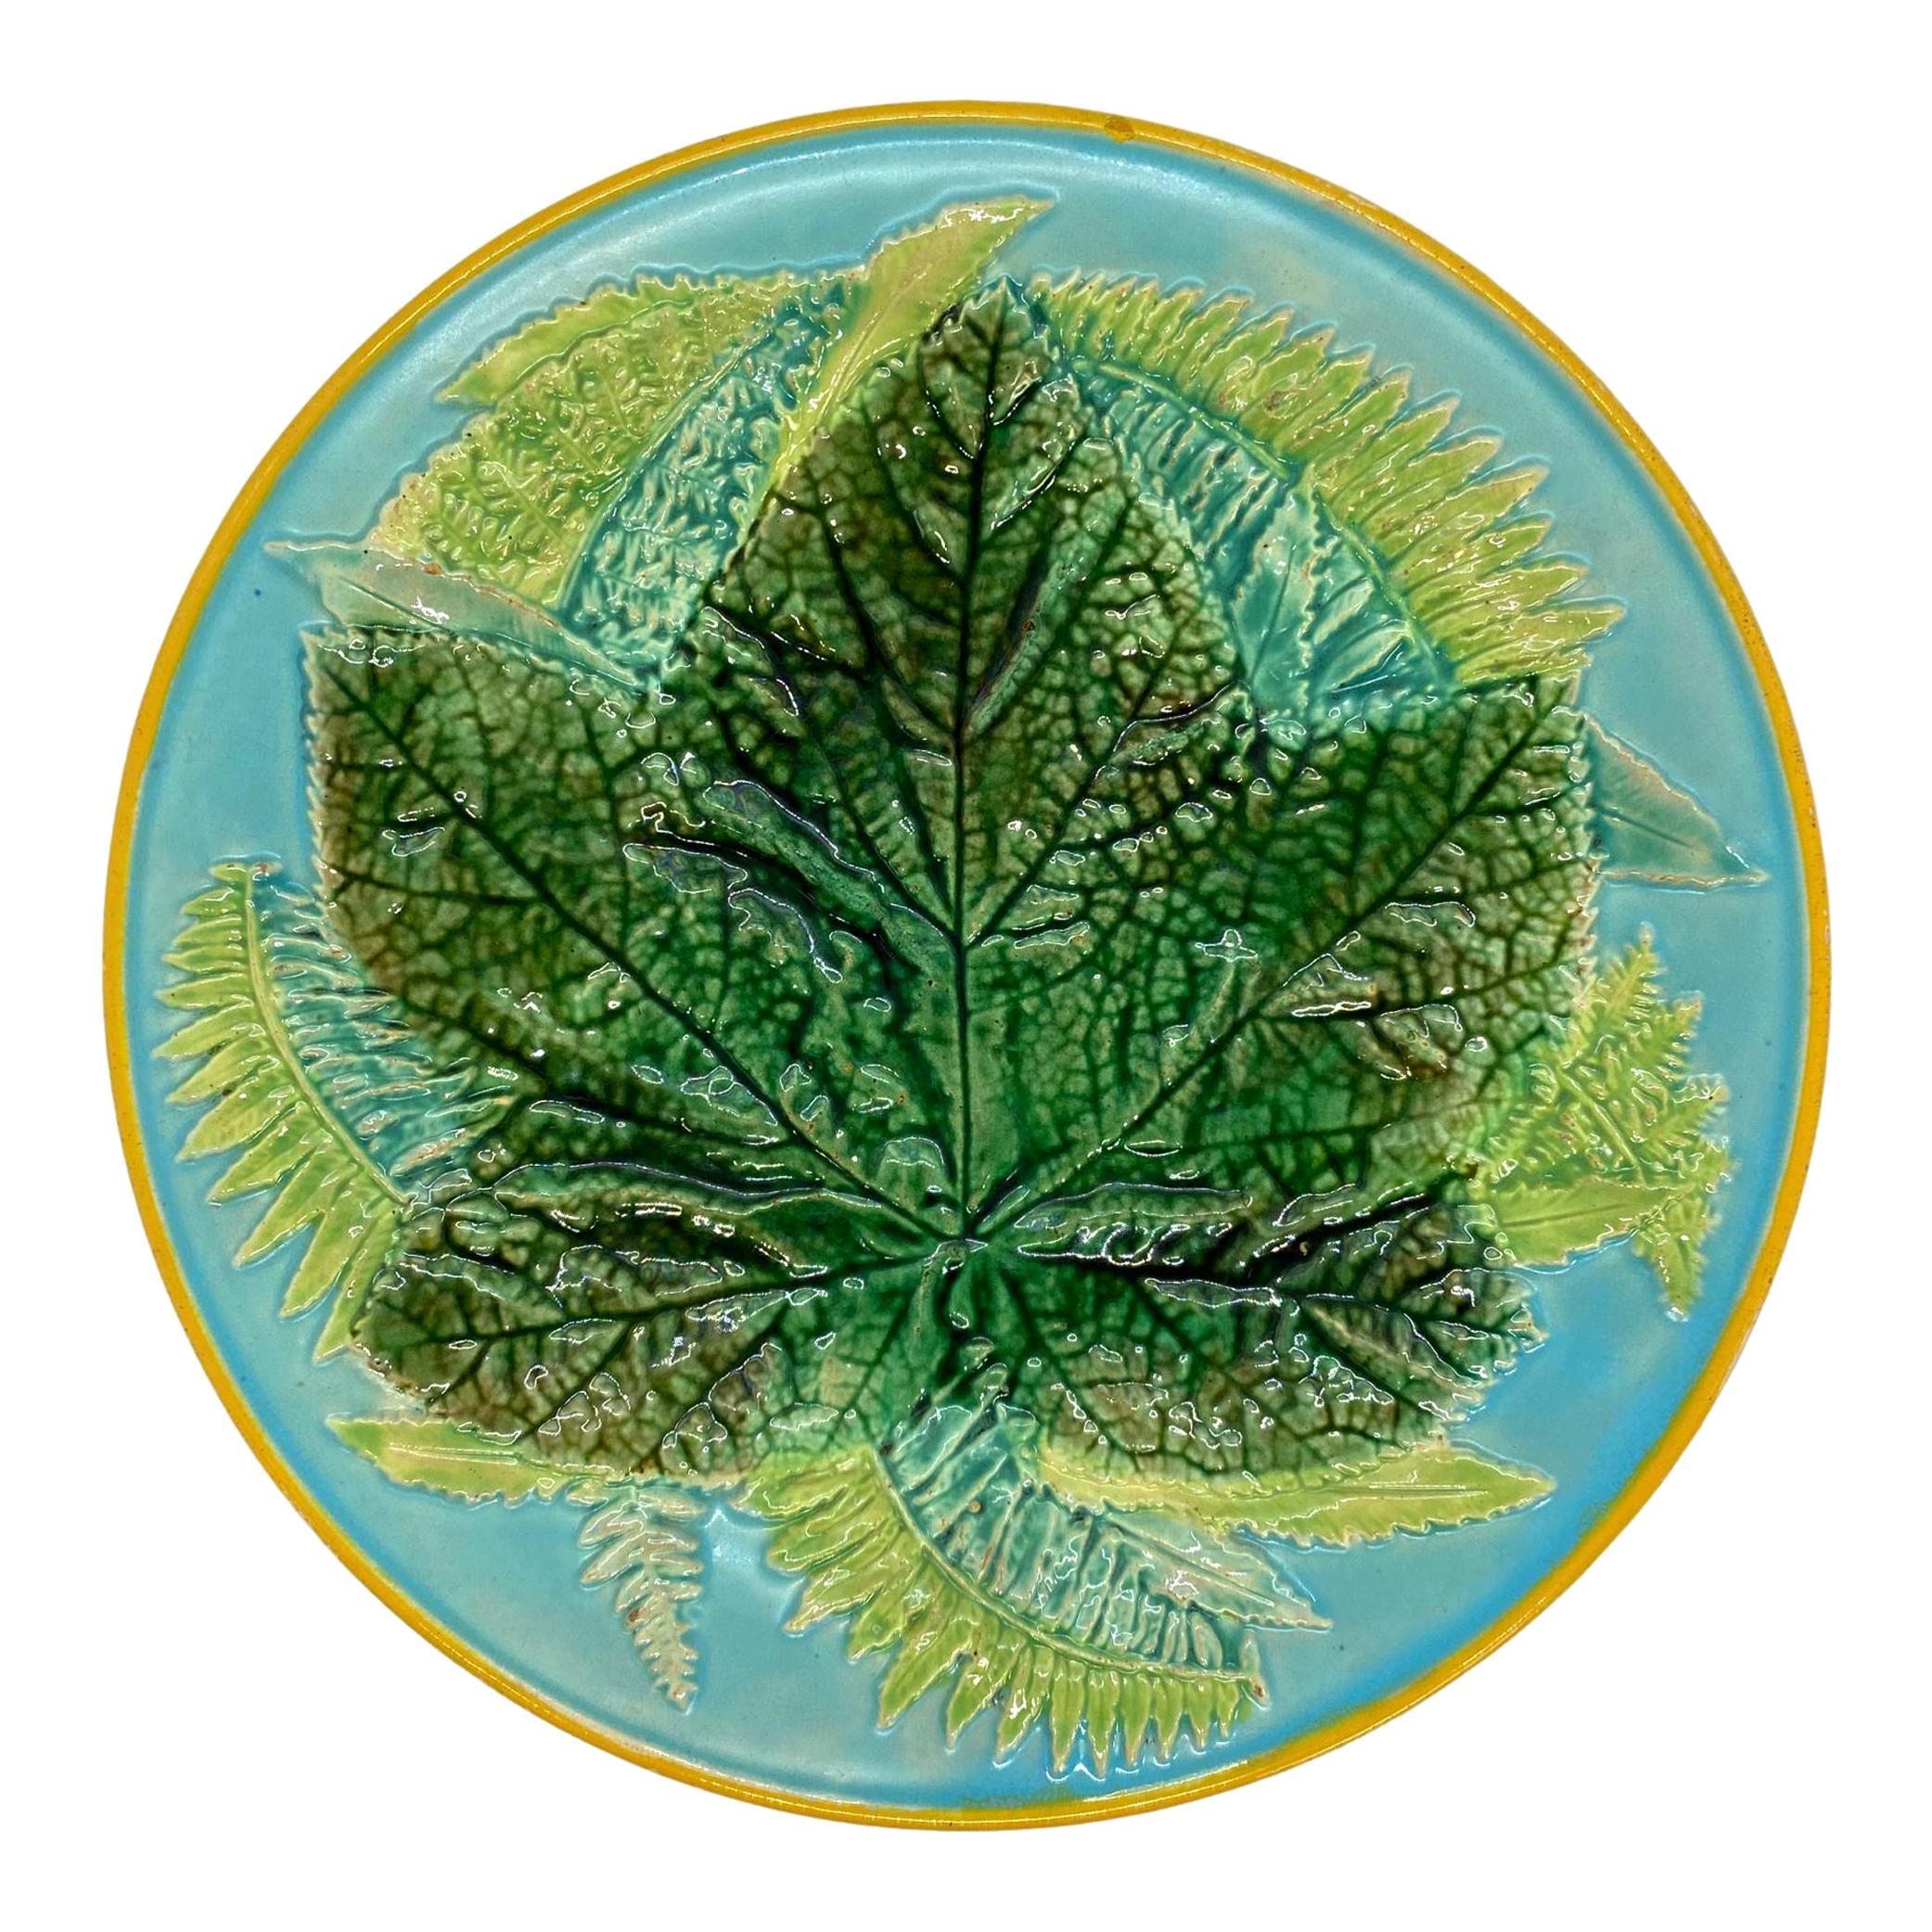 George Jones Majolica Maple Leaf and Ferns Plate on Turquoise, English, ca. 1873